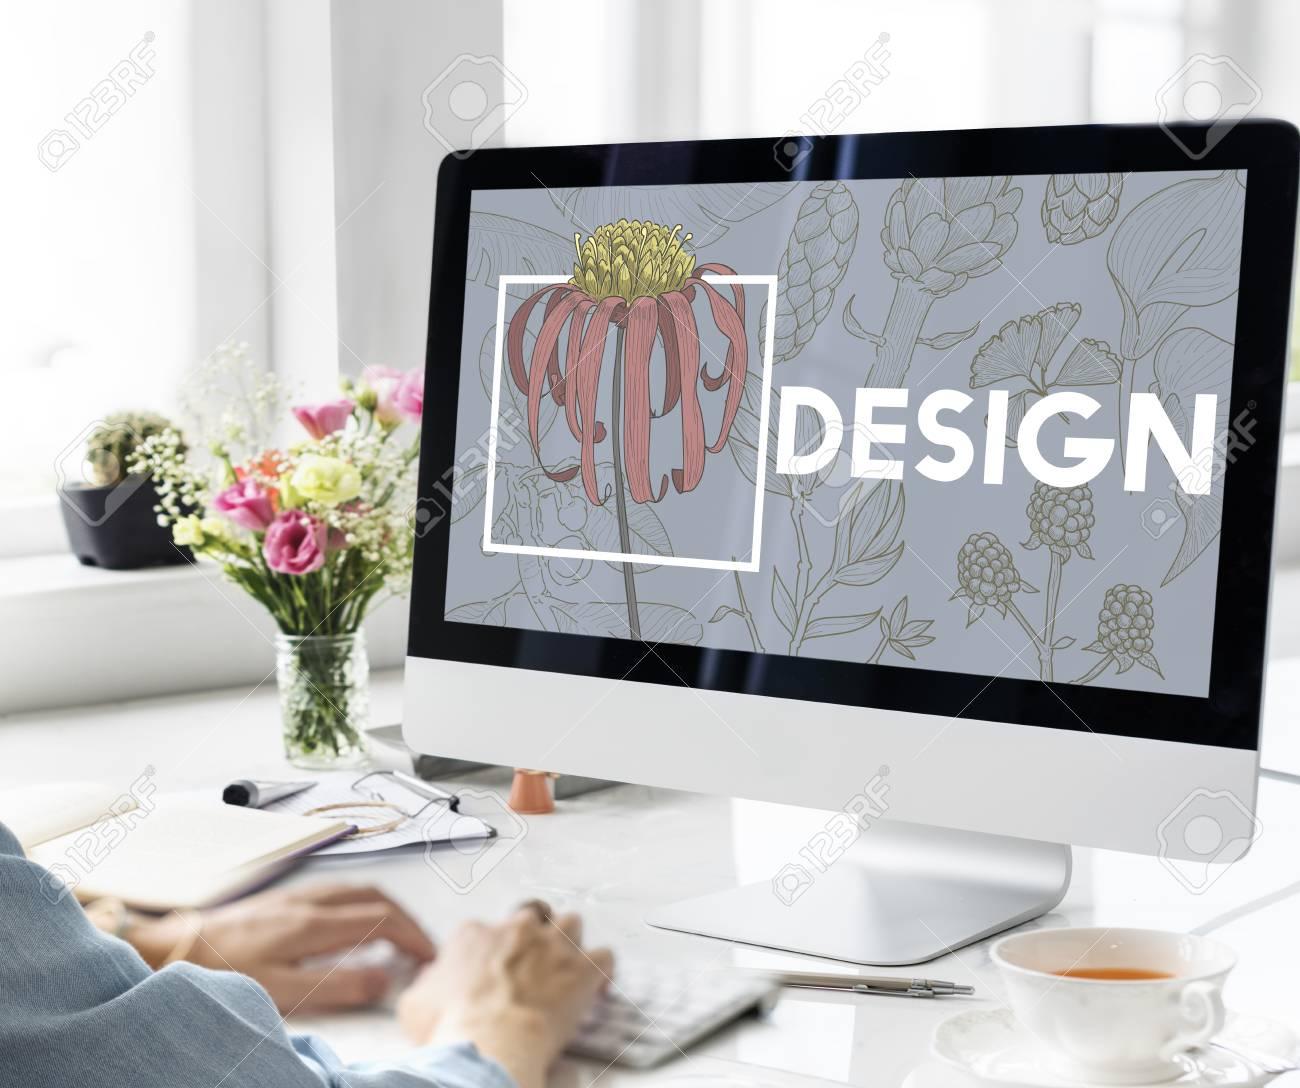 Design Creation Leisure Hobby Ideas Objective Stock Photo - 74143301